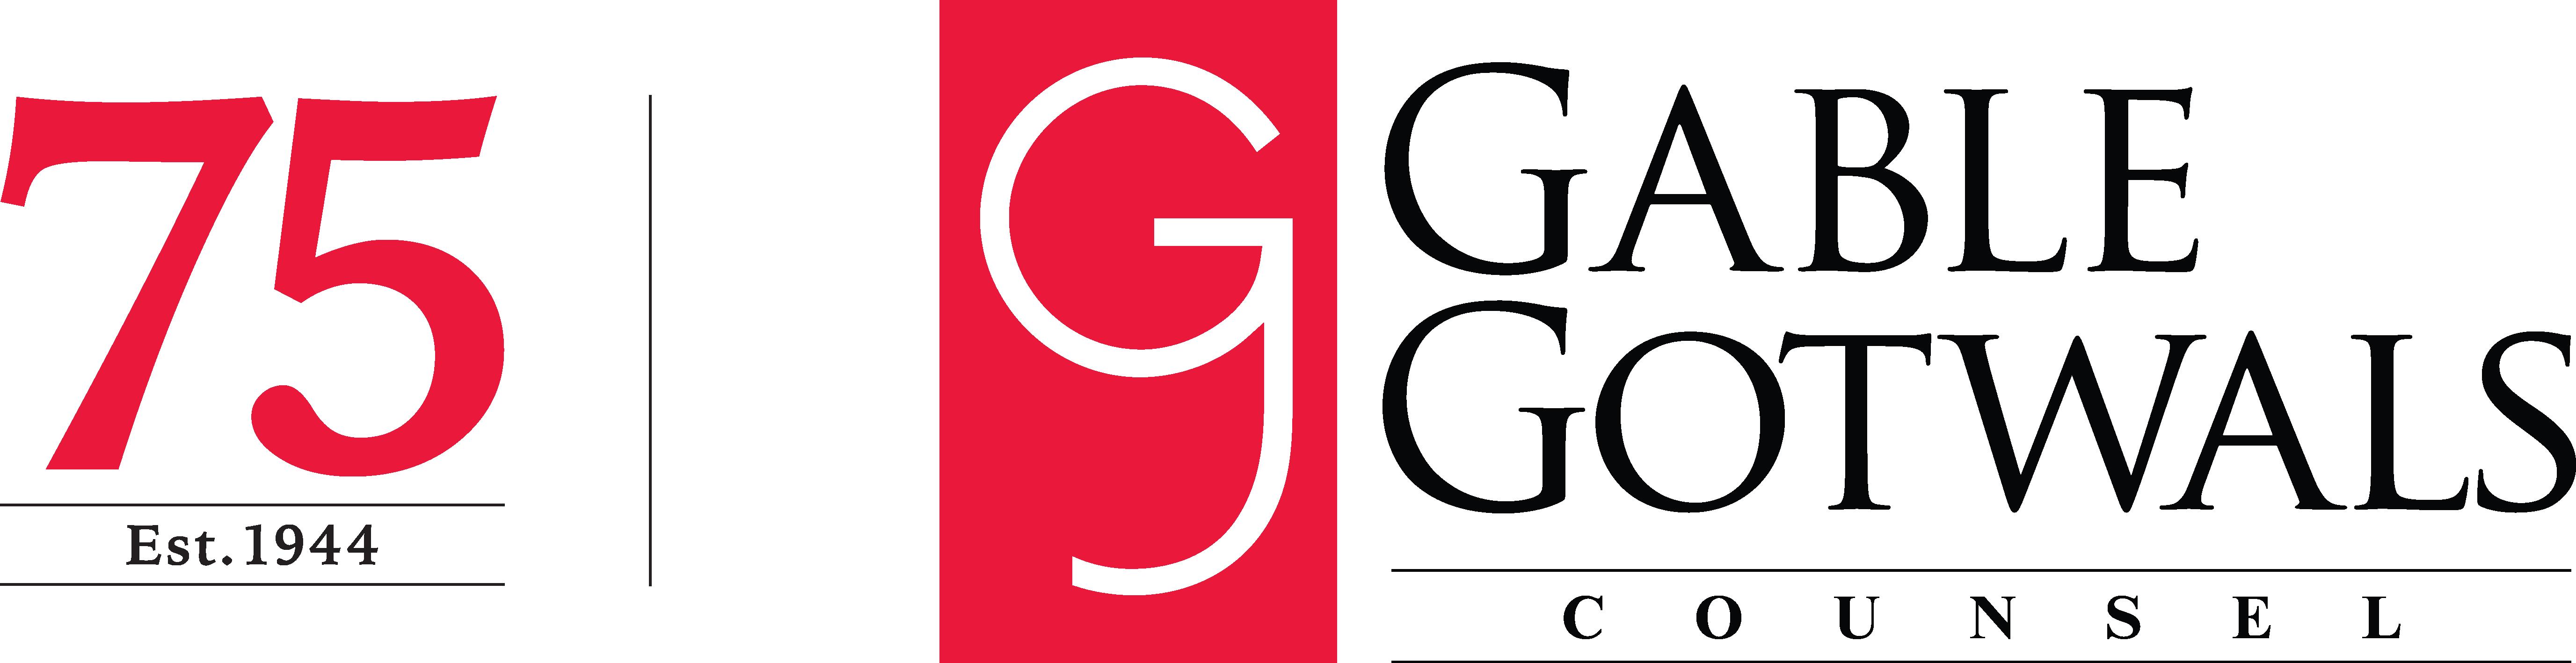 GableGotwals Image